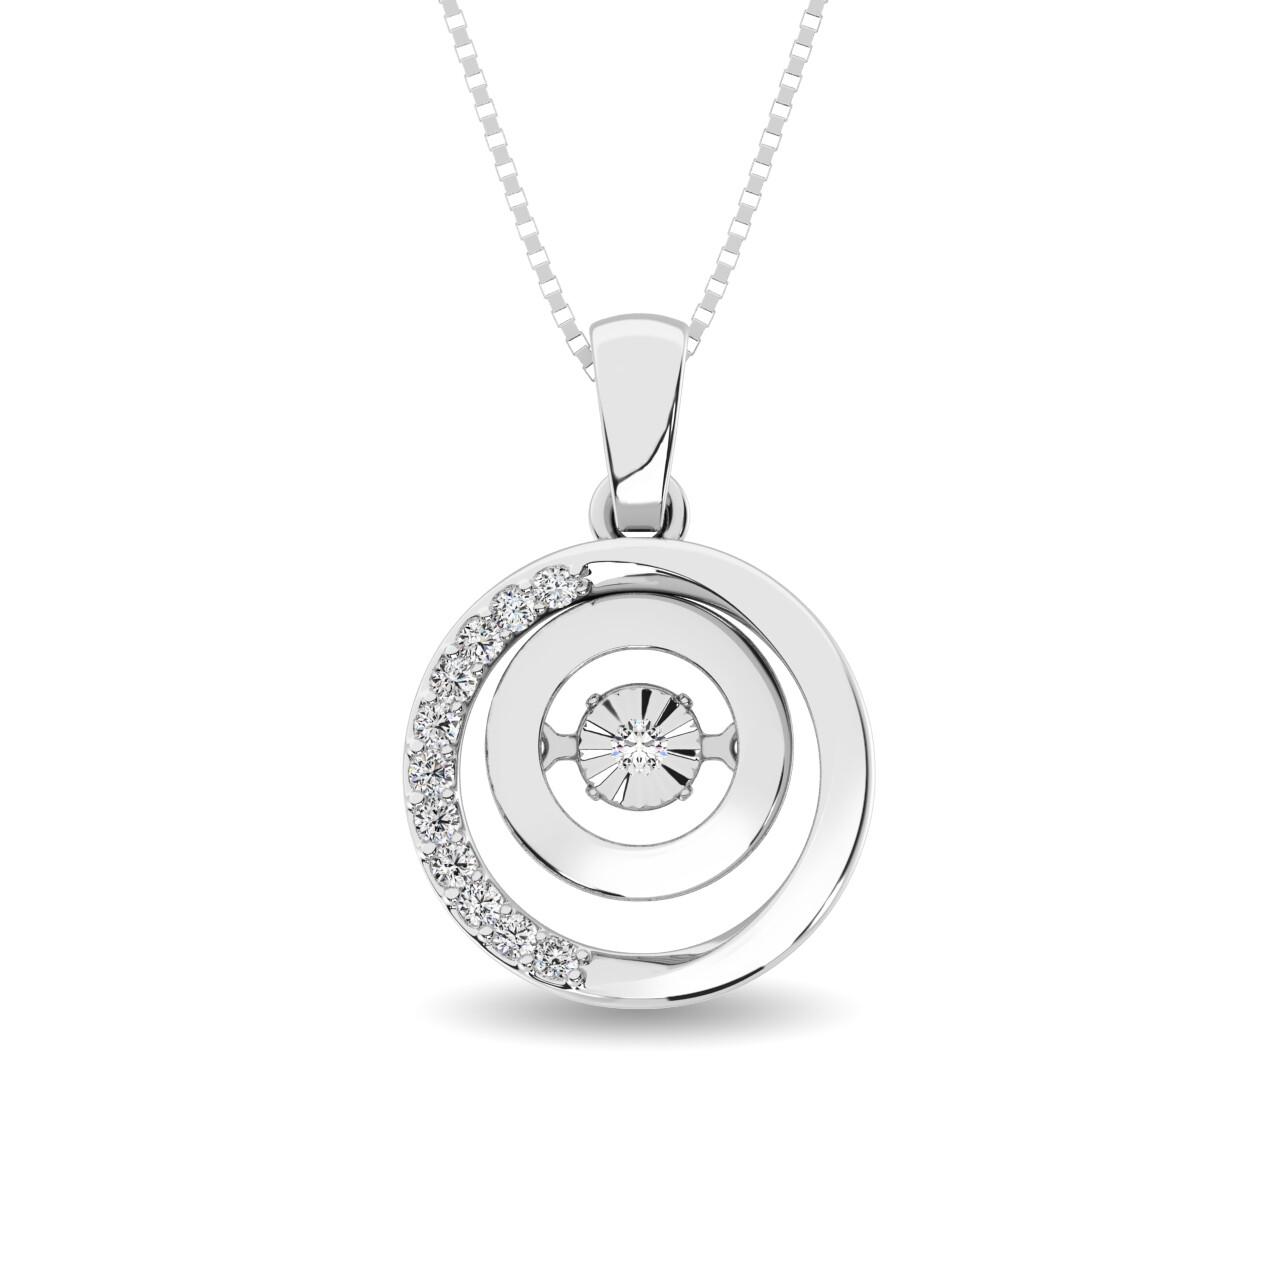 0.10Ctw Silver Circle Dancing Diamond Pendant